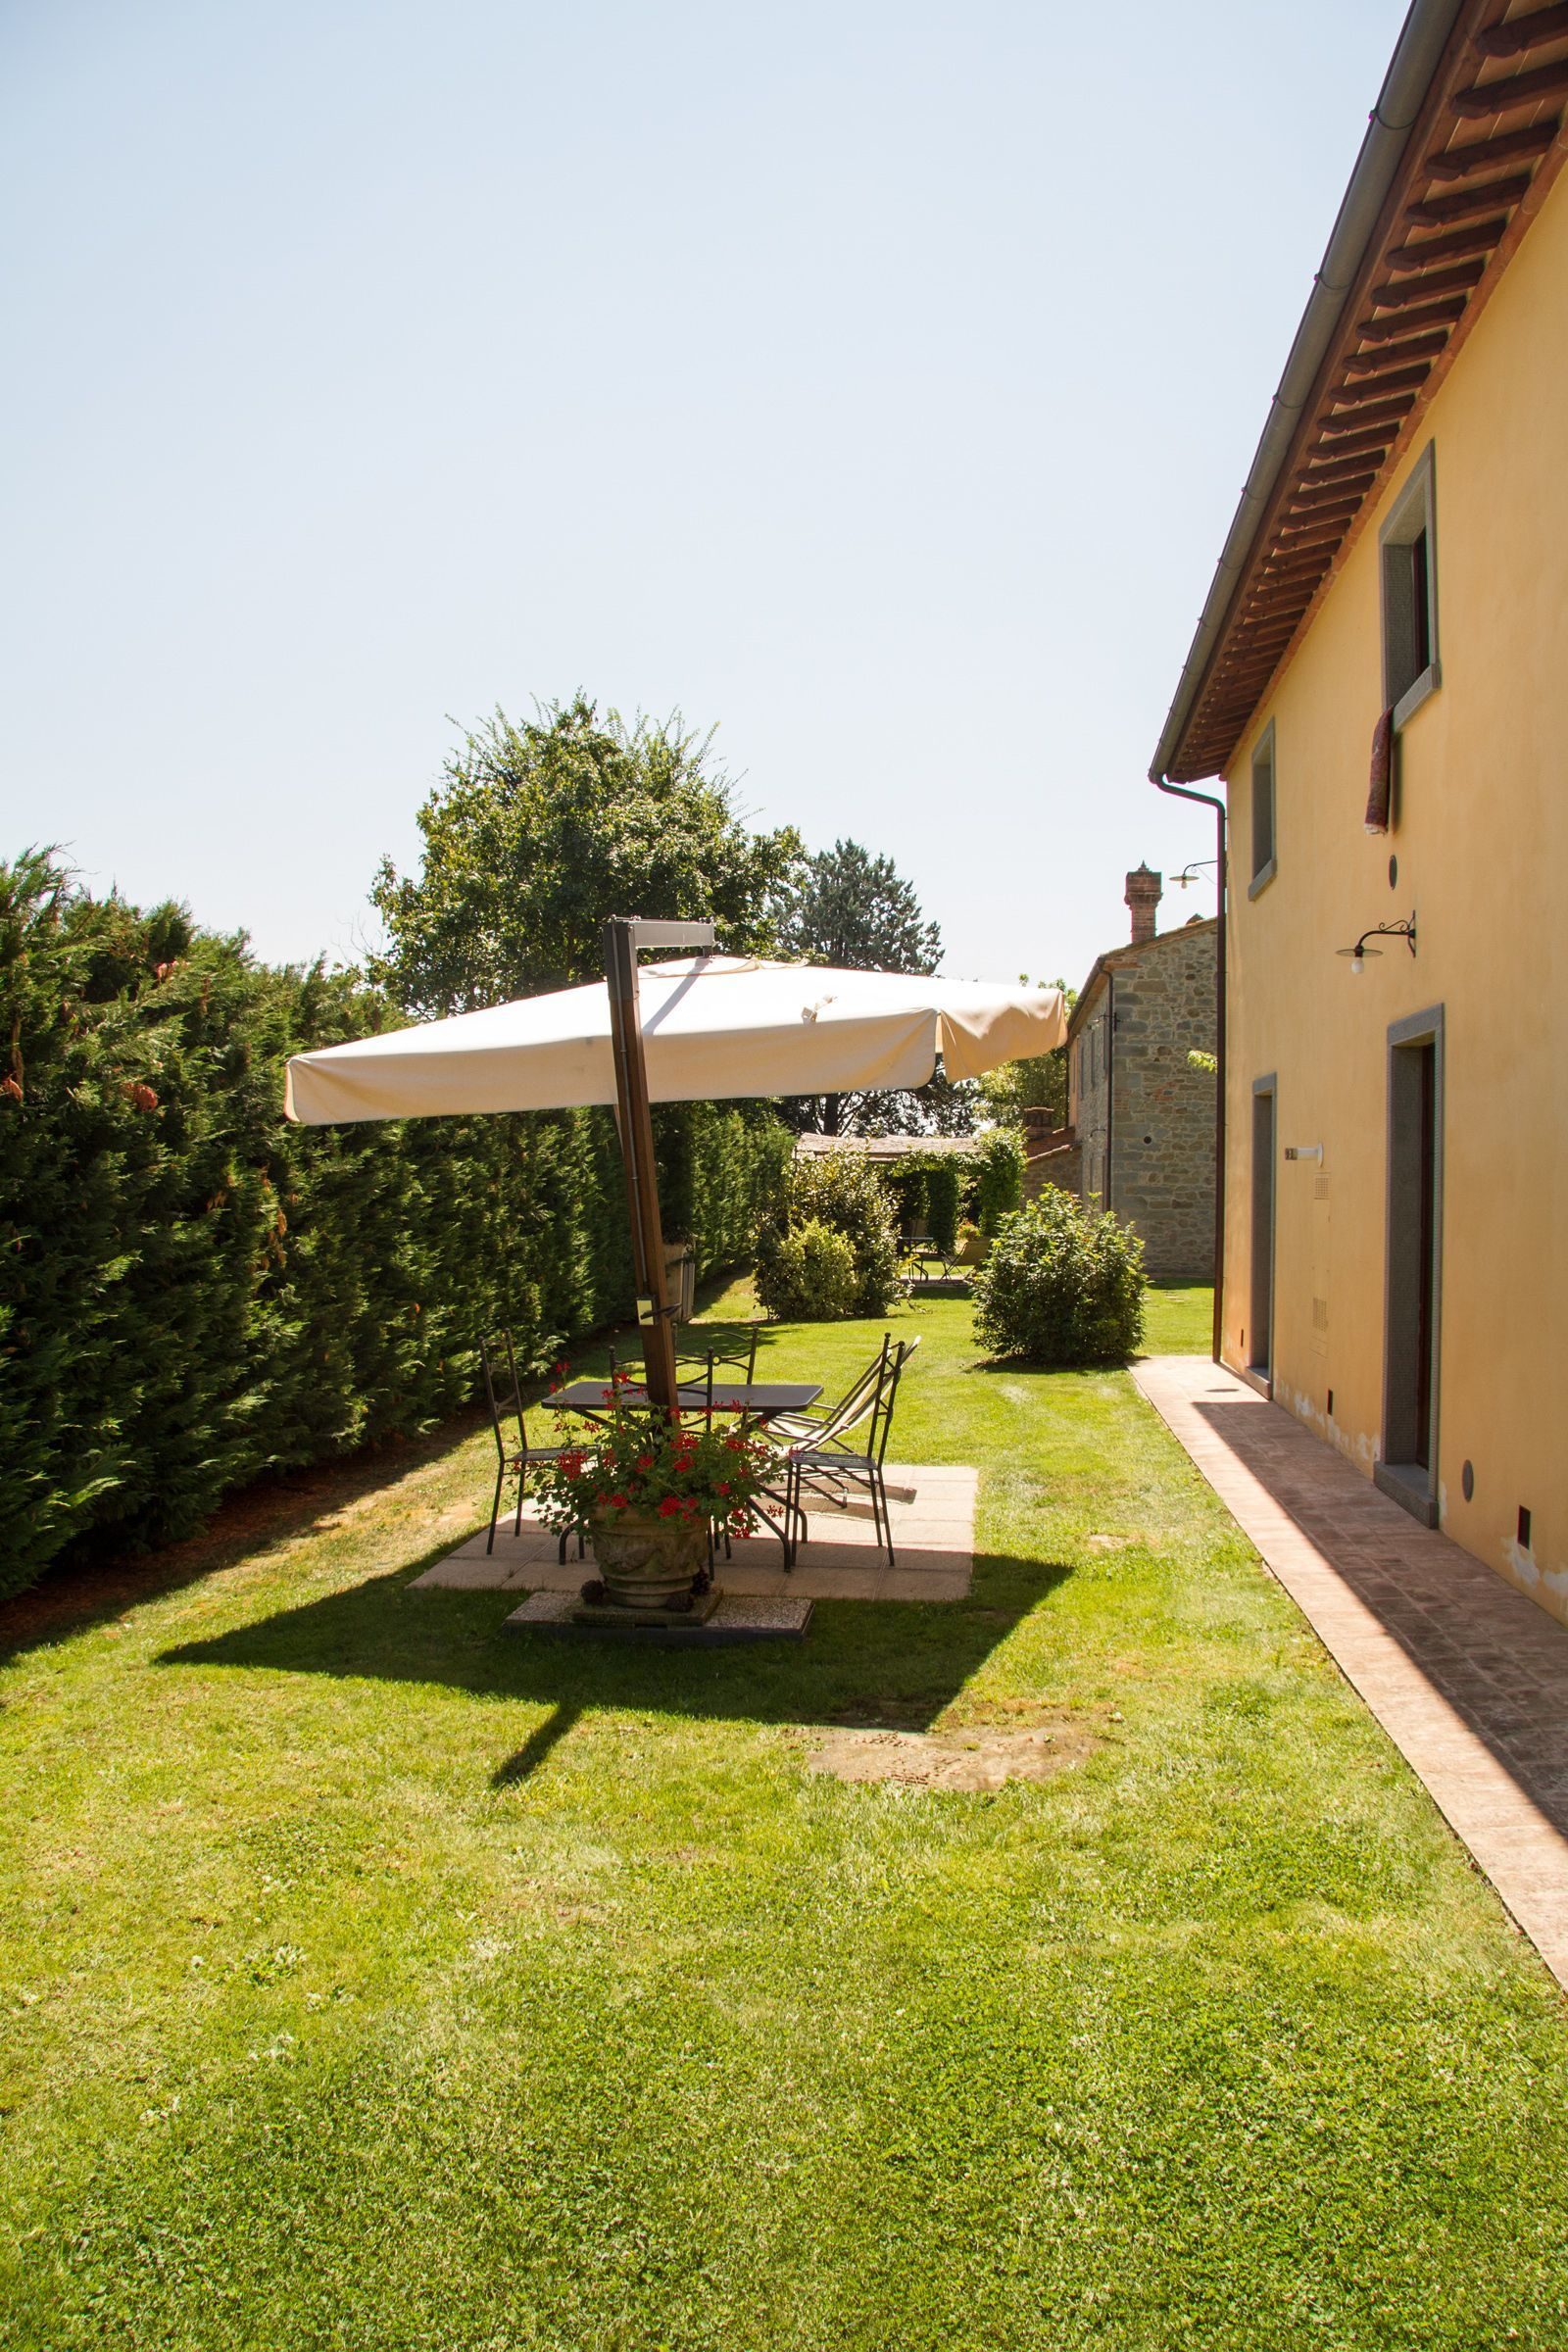 Agriturismo il sambuco 25 slaapplaatsen in 9 slaapkamers - Giardini curati ...